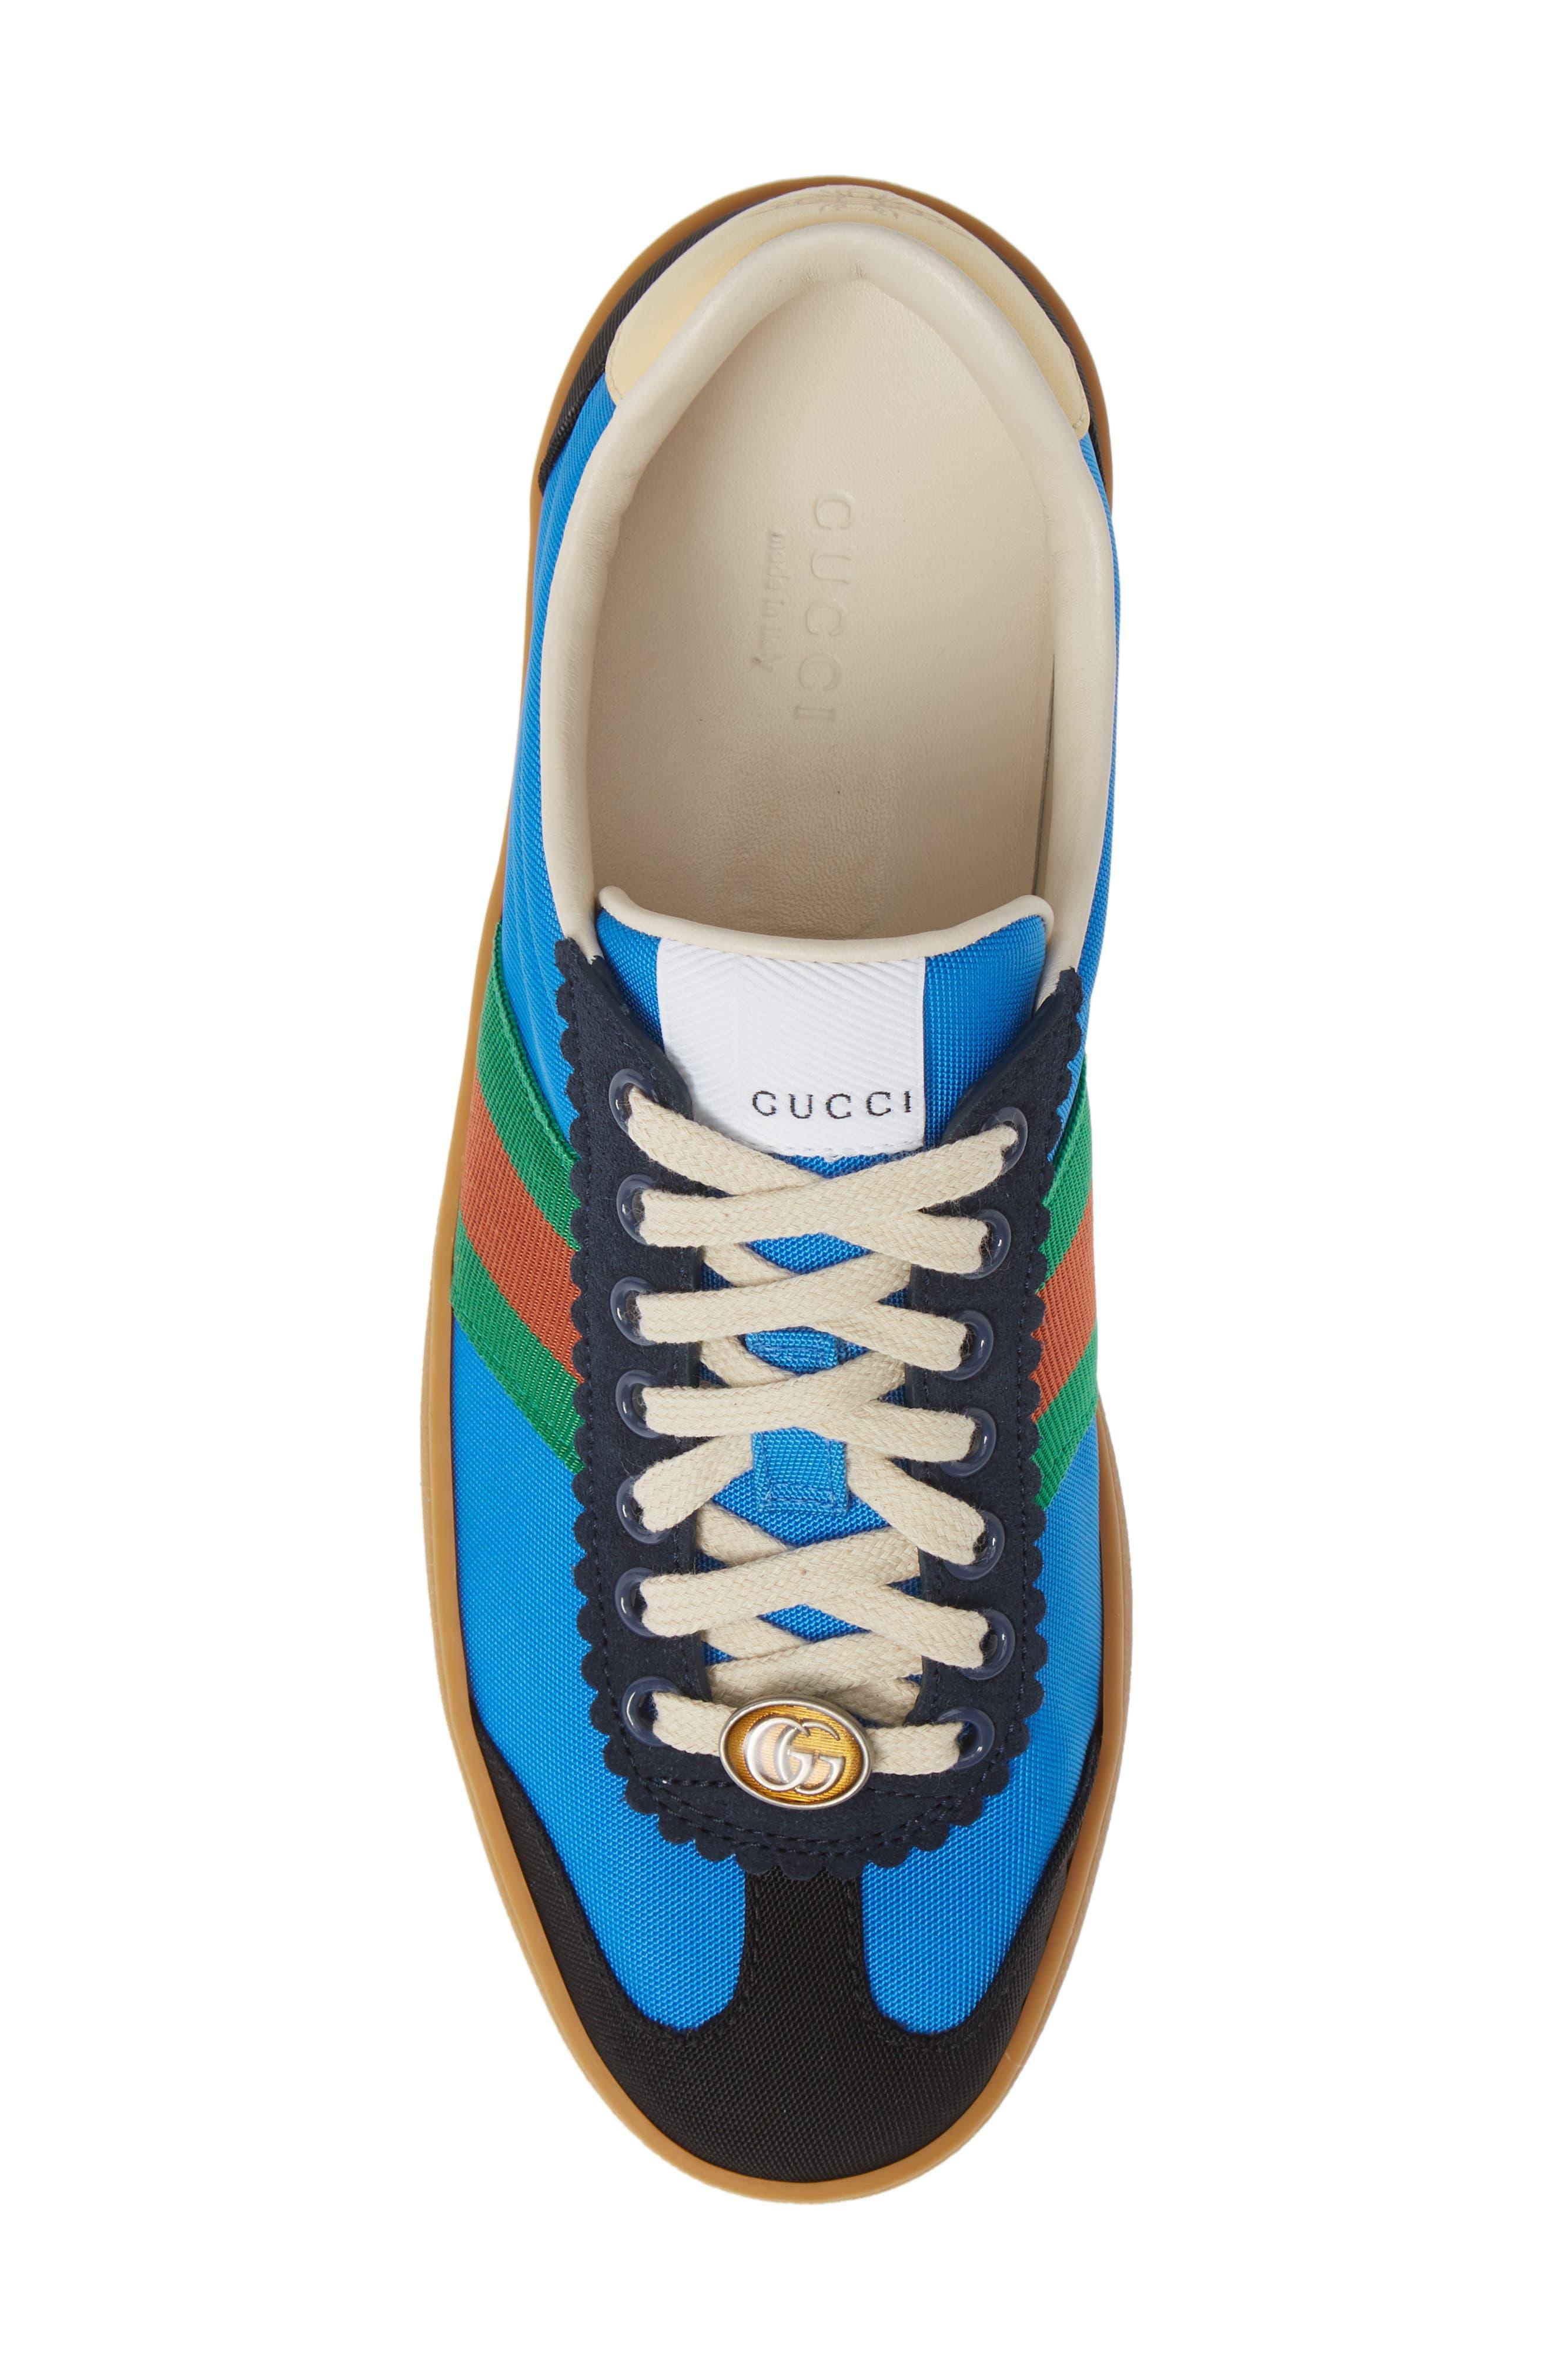 GUCCI, G74 Low Top Sneaker, Alternate thumbnail 5, color, 400